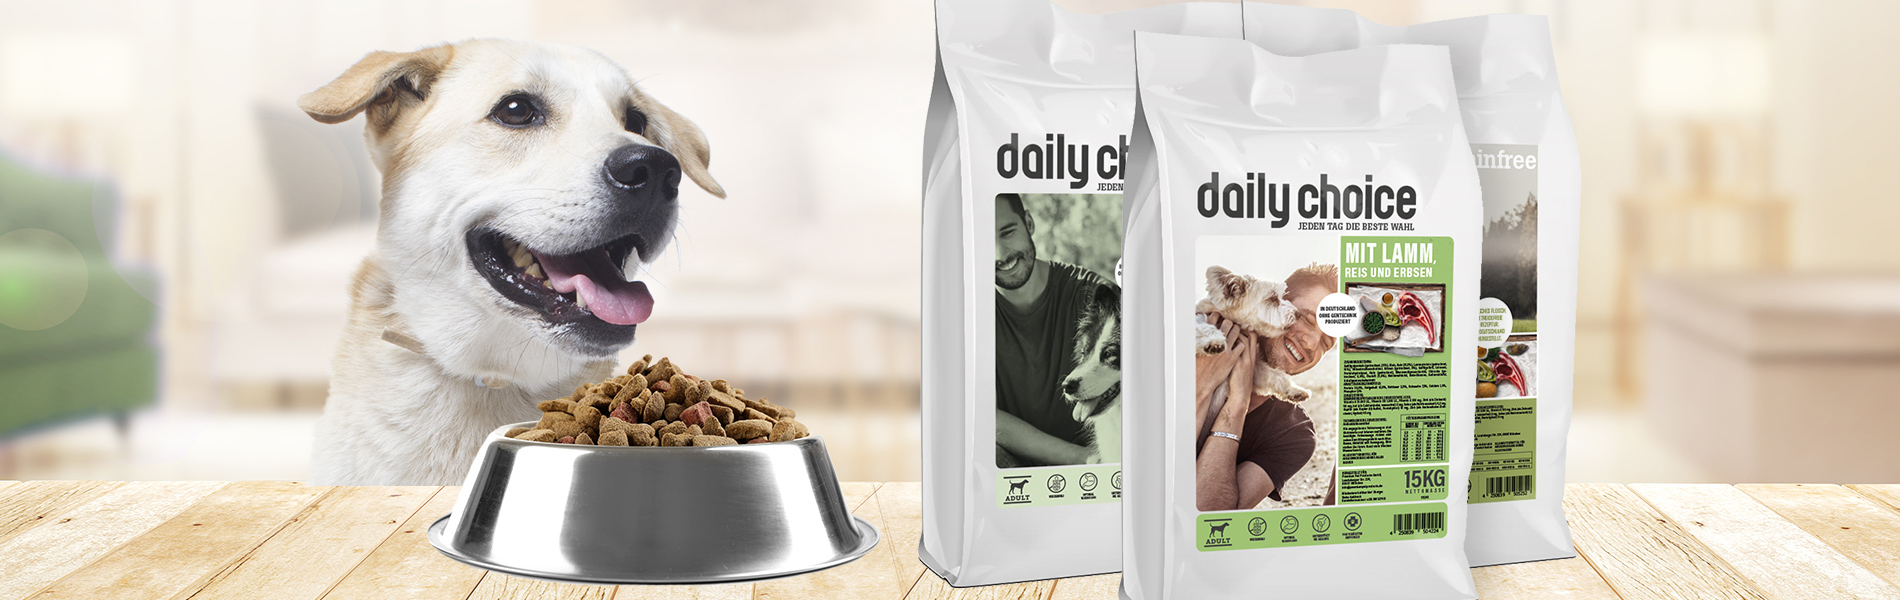 daily choice Hund Trockenfutter die beste Wahl